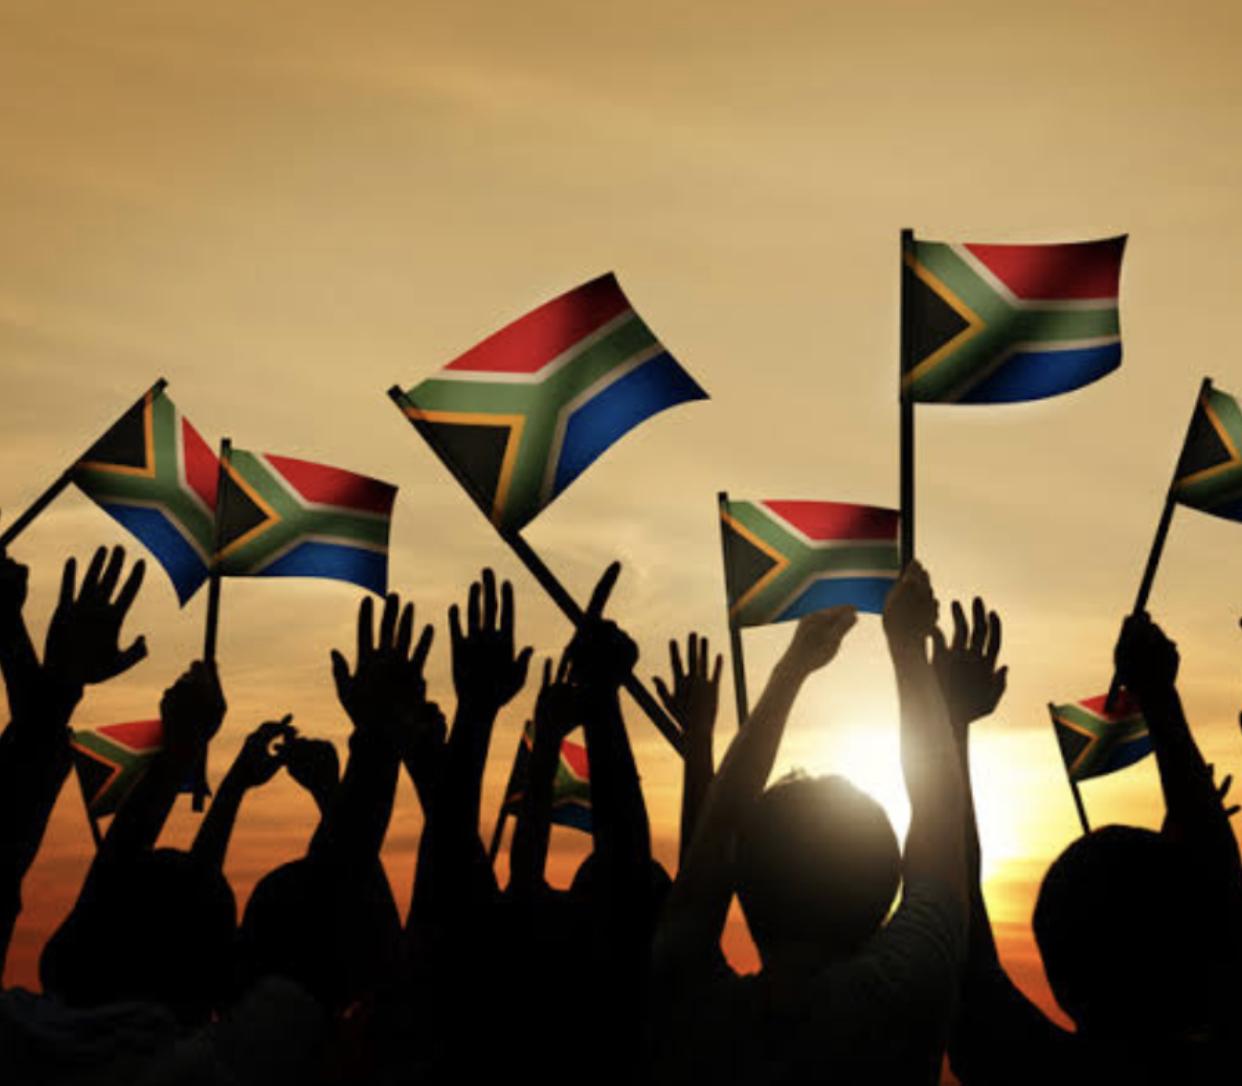 Freedom Day image